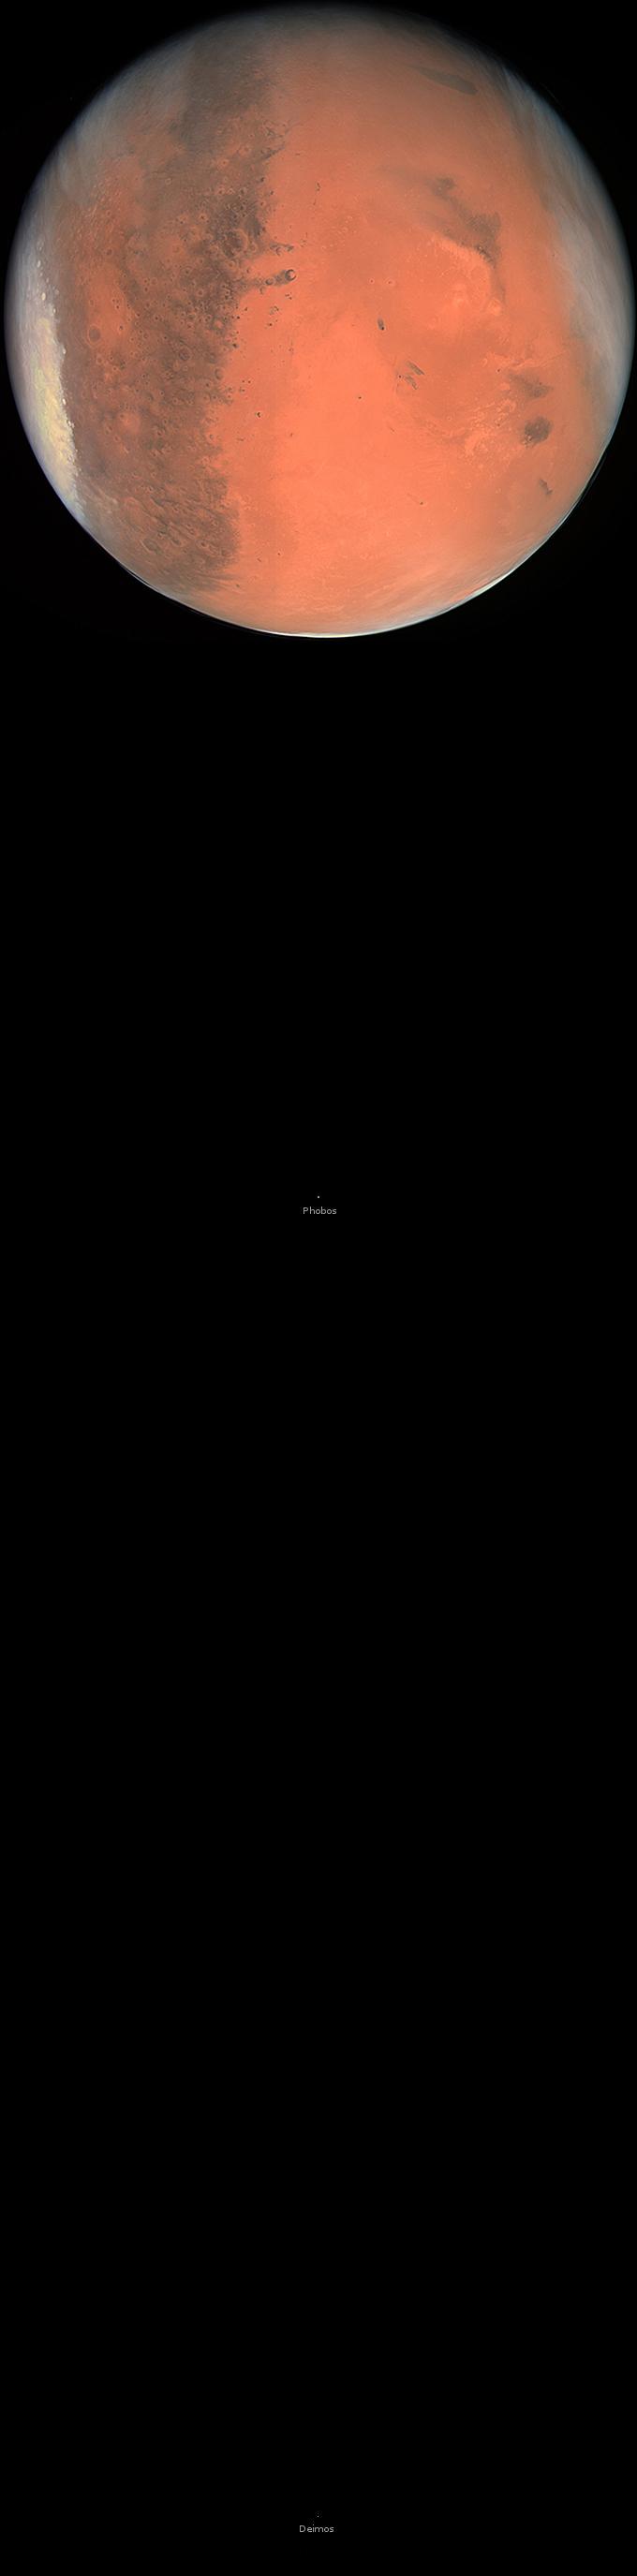 https://upload.wikimedia.org/wikipedia/commons/2/23/Mars_Moons_Orbit_distance_flipped.jpeg